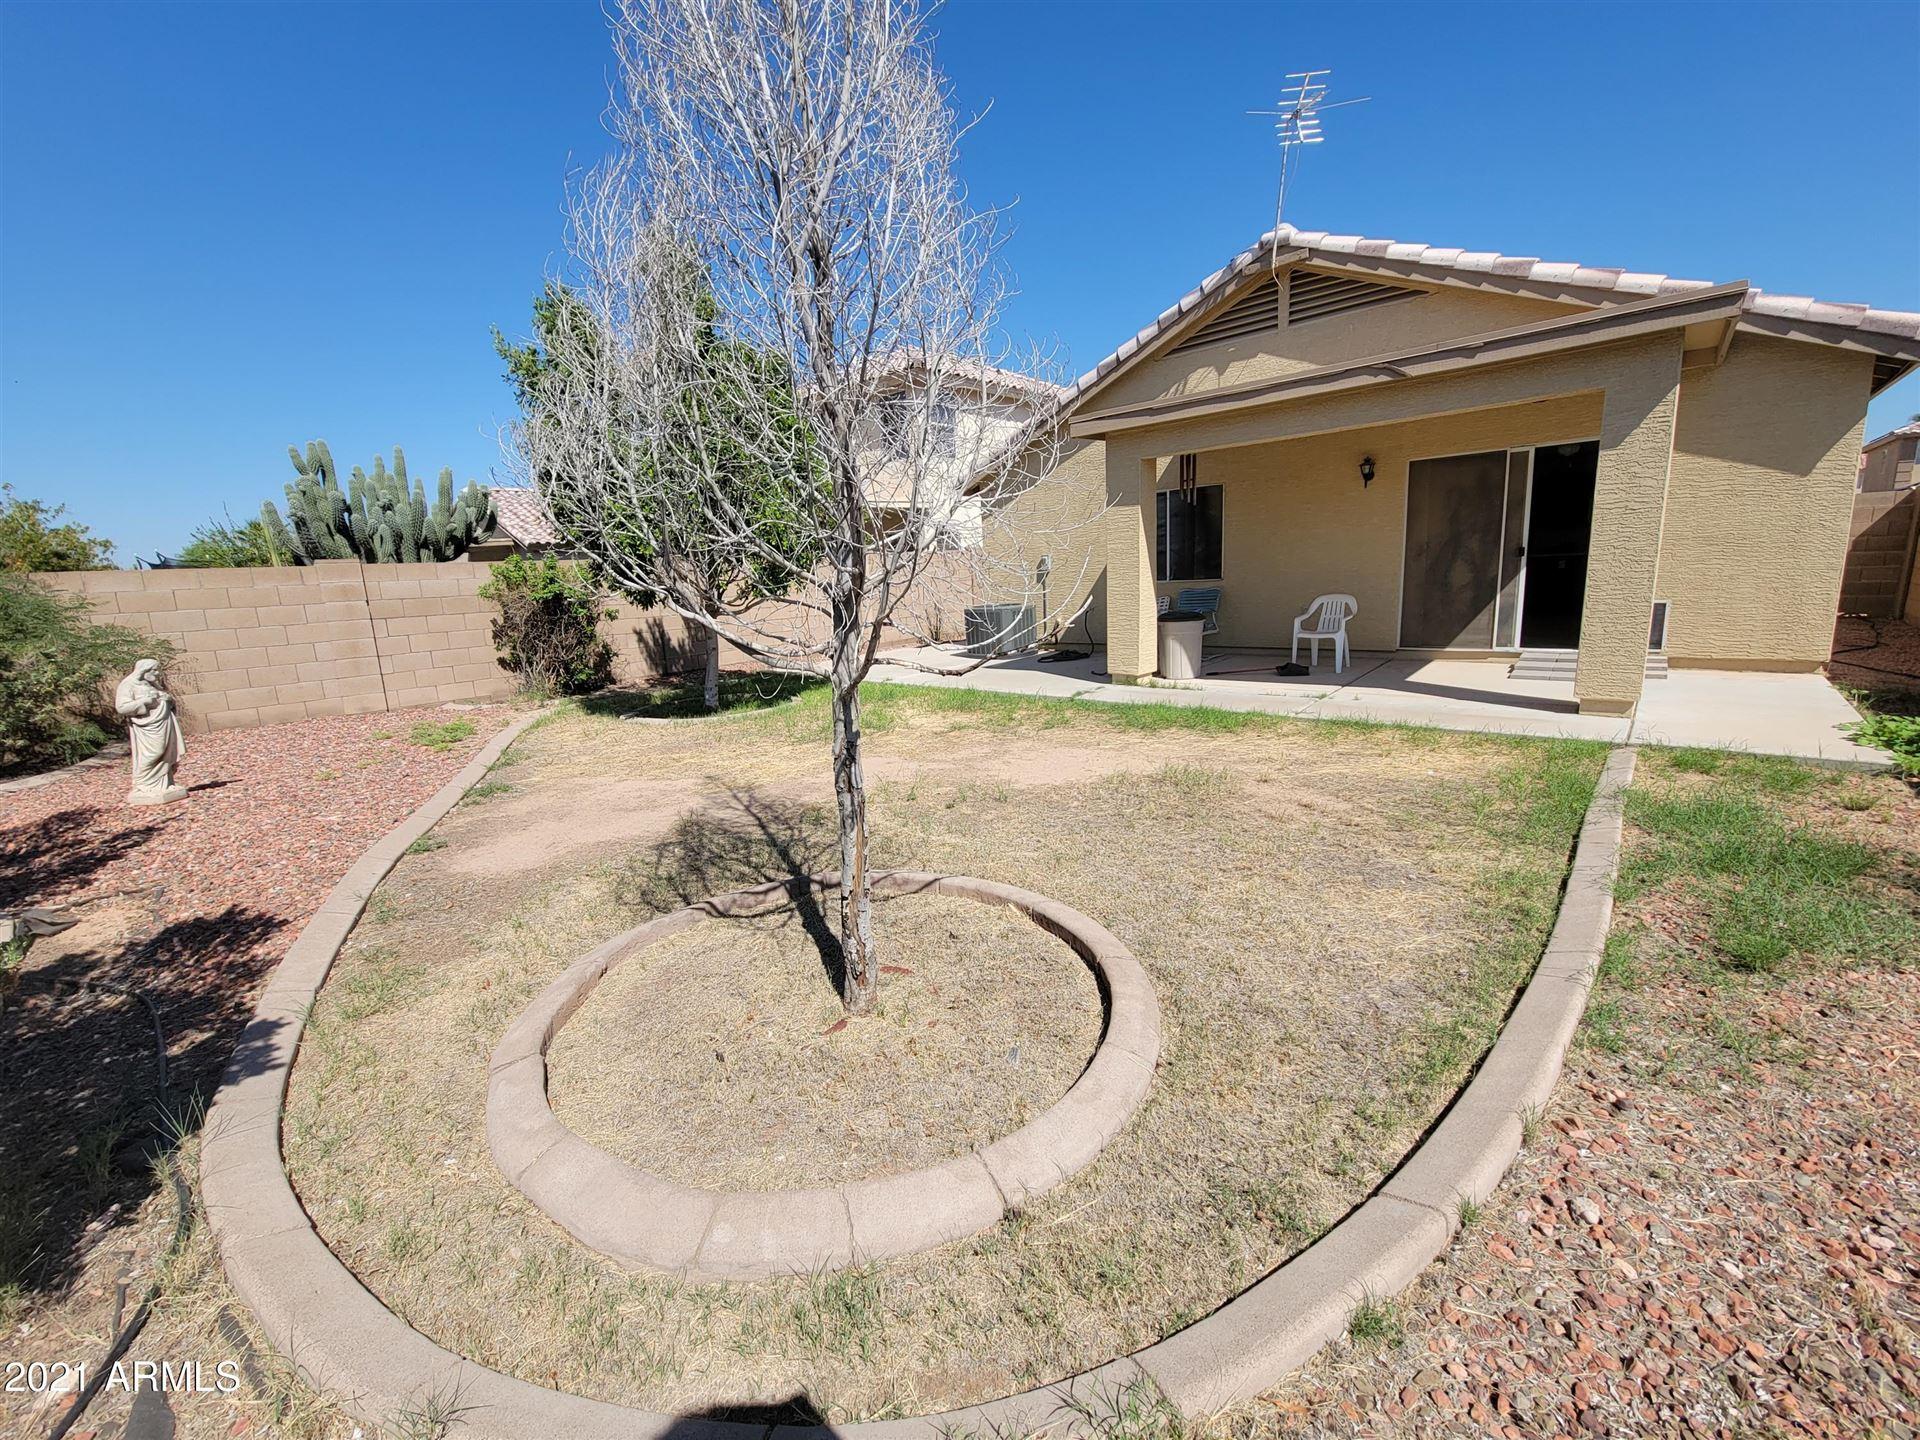 Photo of 13001 W LAUREL Lane, El Mirage, AZ 85335 (MLS # 6283797)